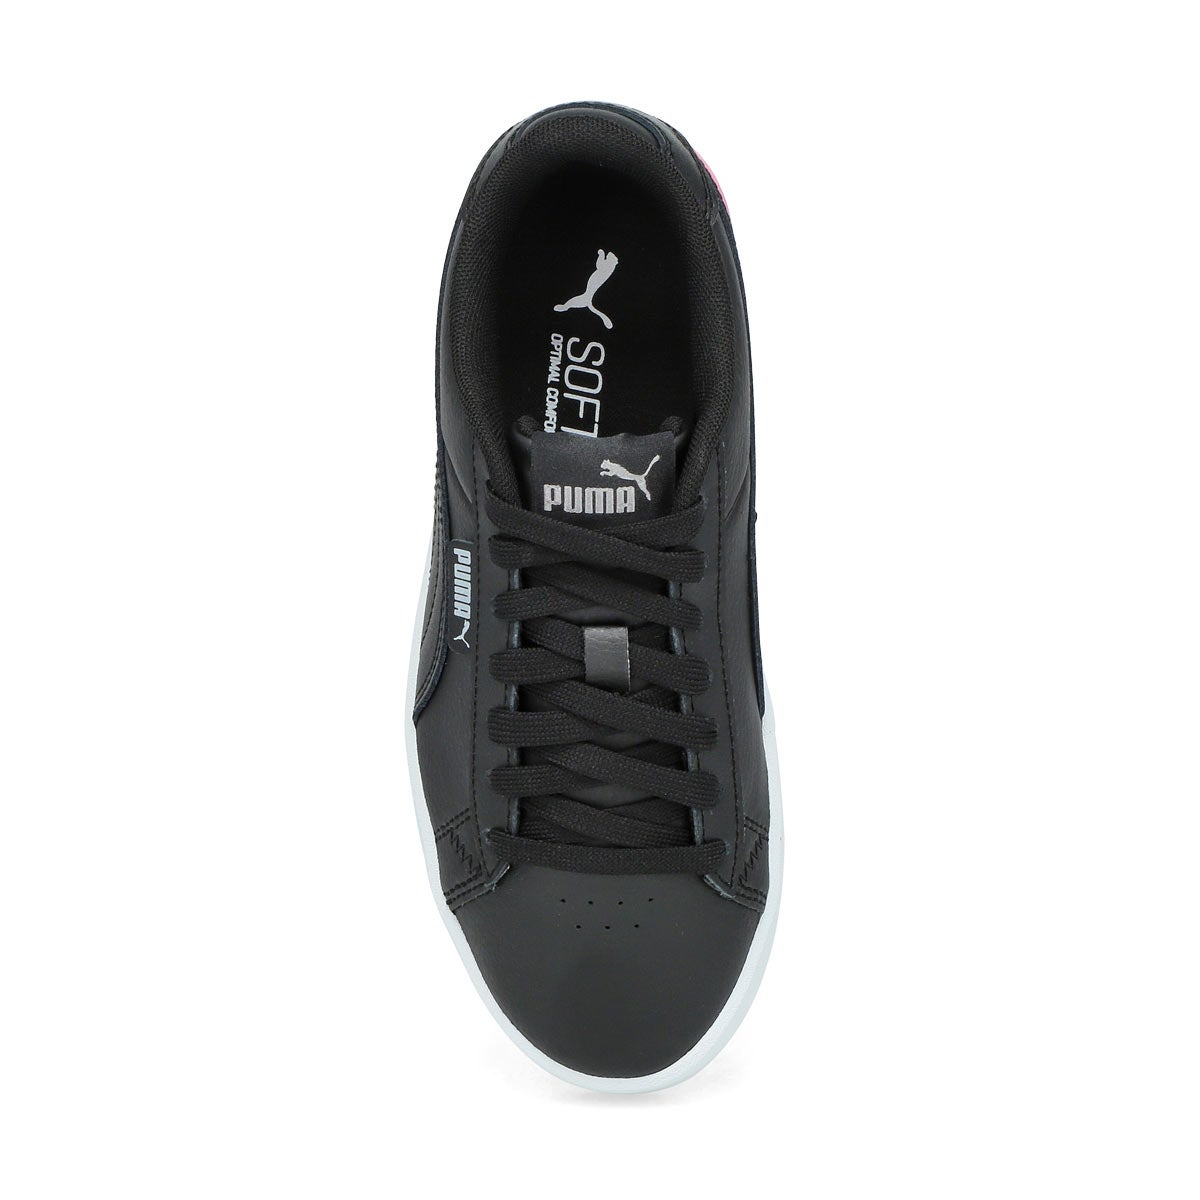 Girls' Puma Jada Jr Sneaker- Black/Silver/Peony